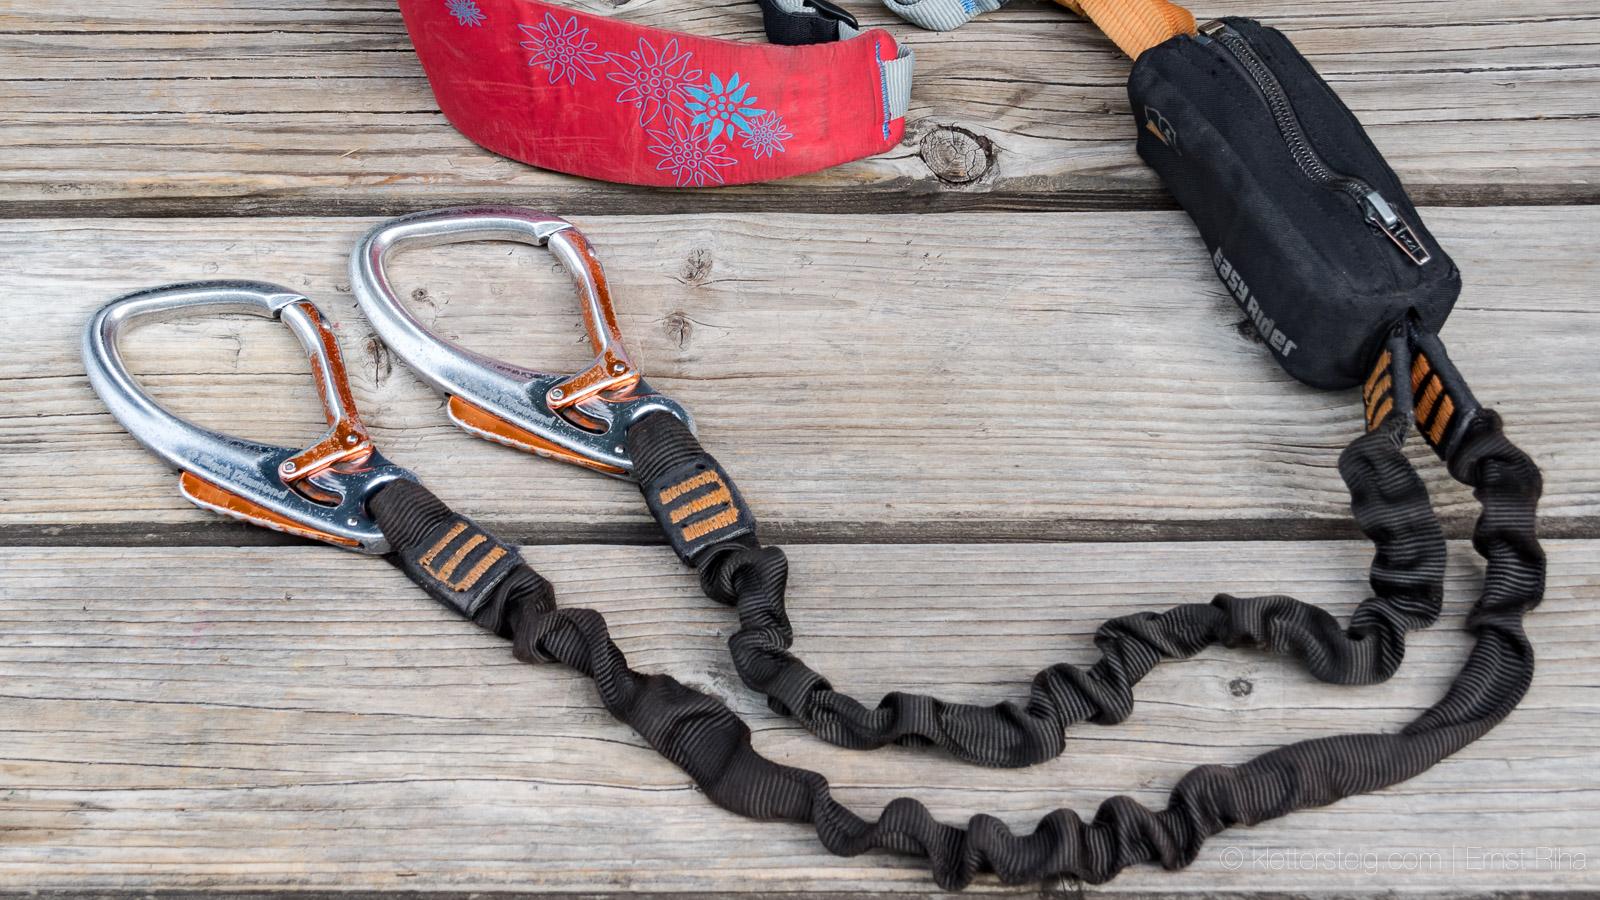 Klettersteigset Neue Norm : Klettersteigset neue norm klettersteige